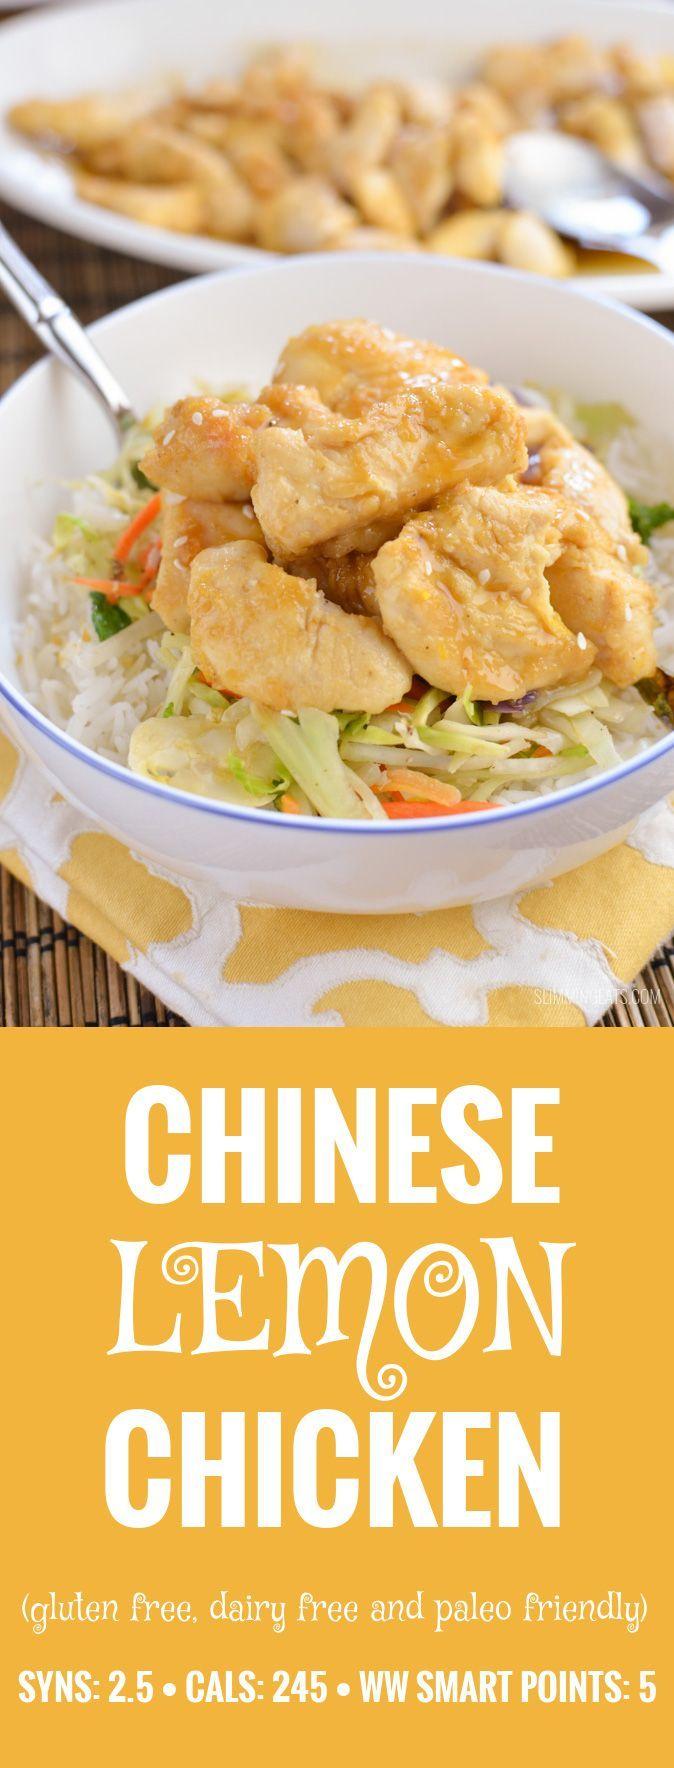 Slimming Eats Chinese Lemon Chicken - gluten free, dairy free, paleo, Slimming World and Weight Watchers friendly